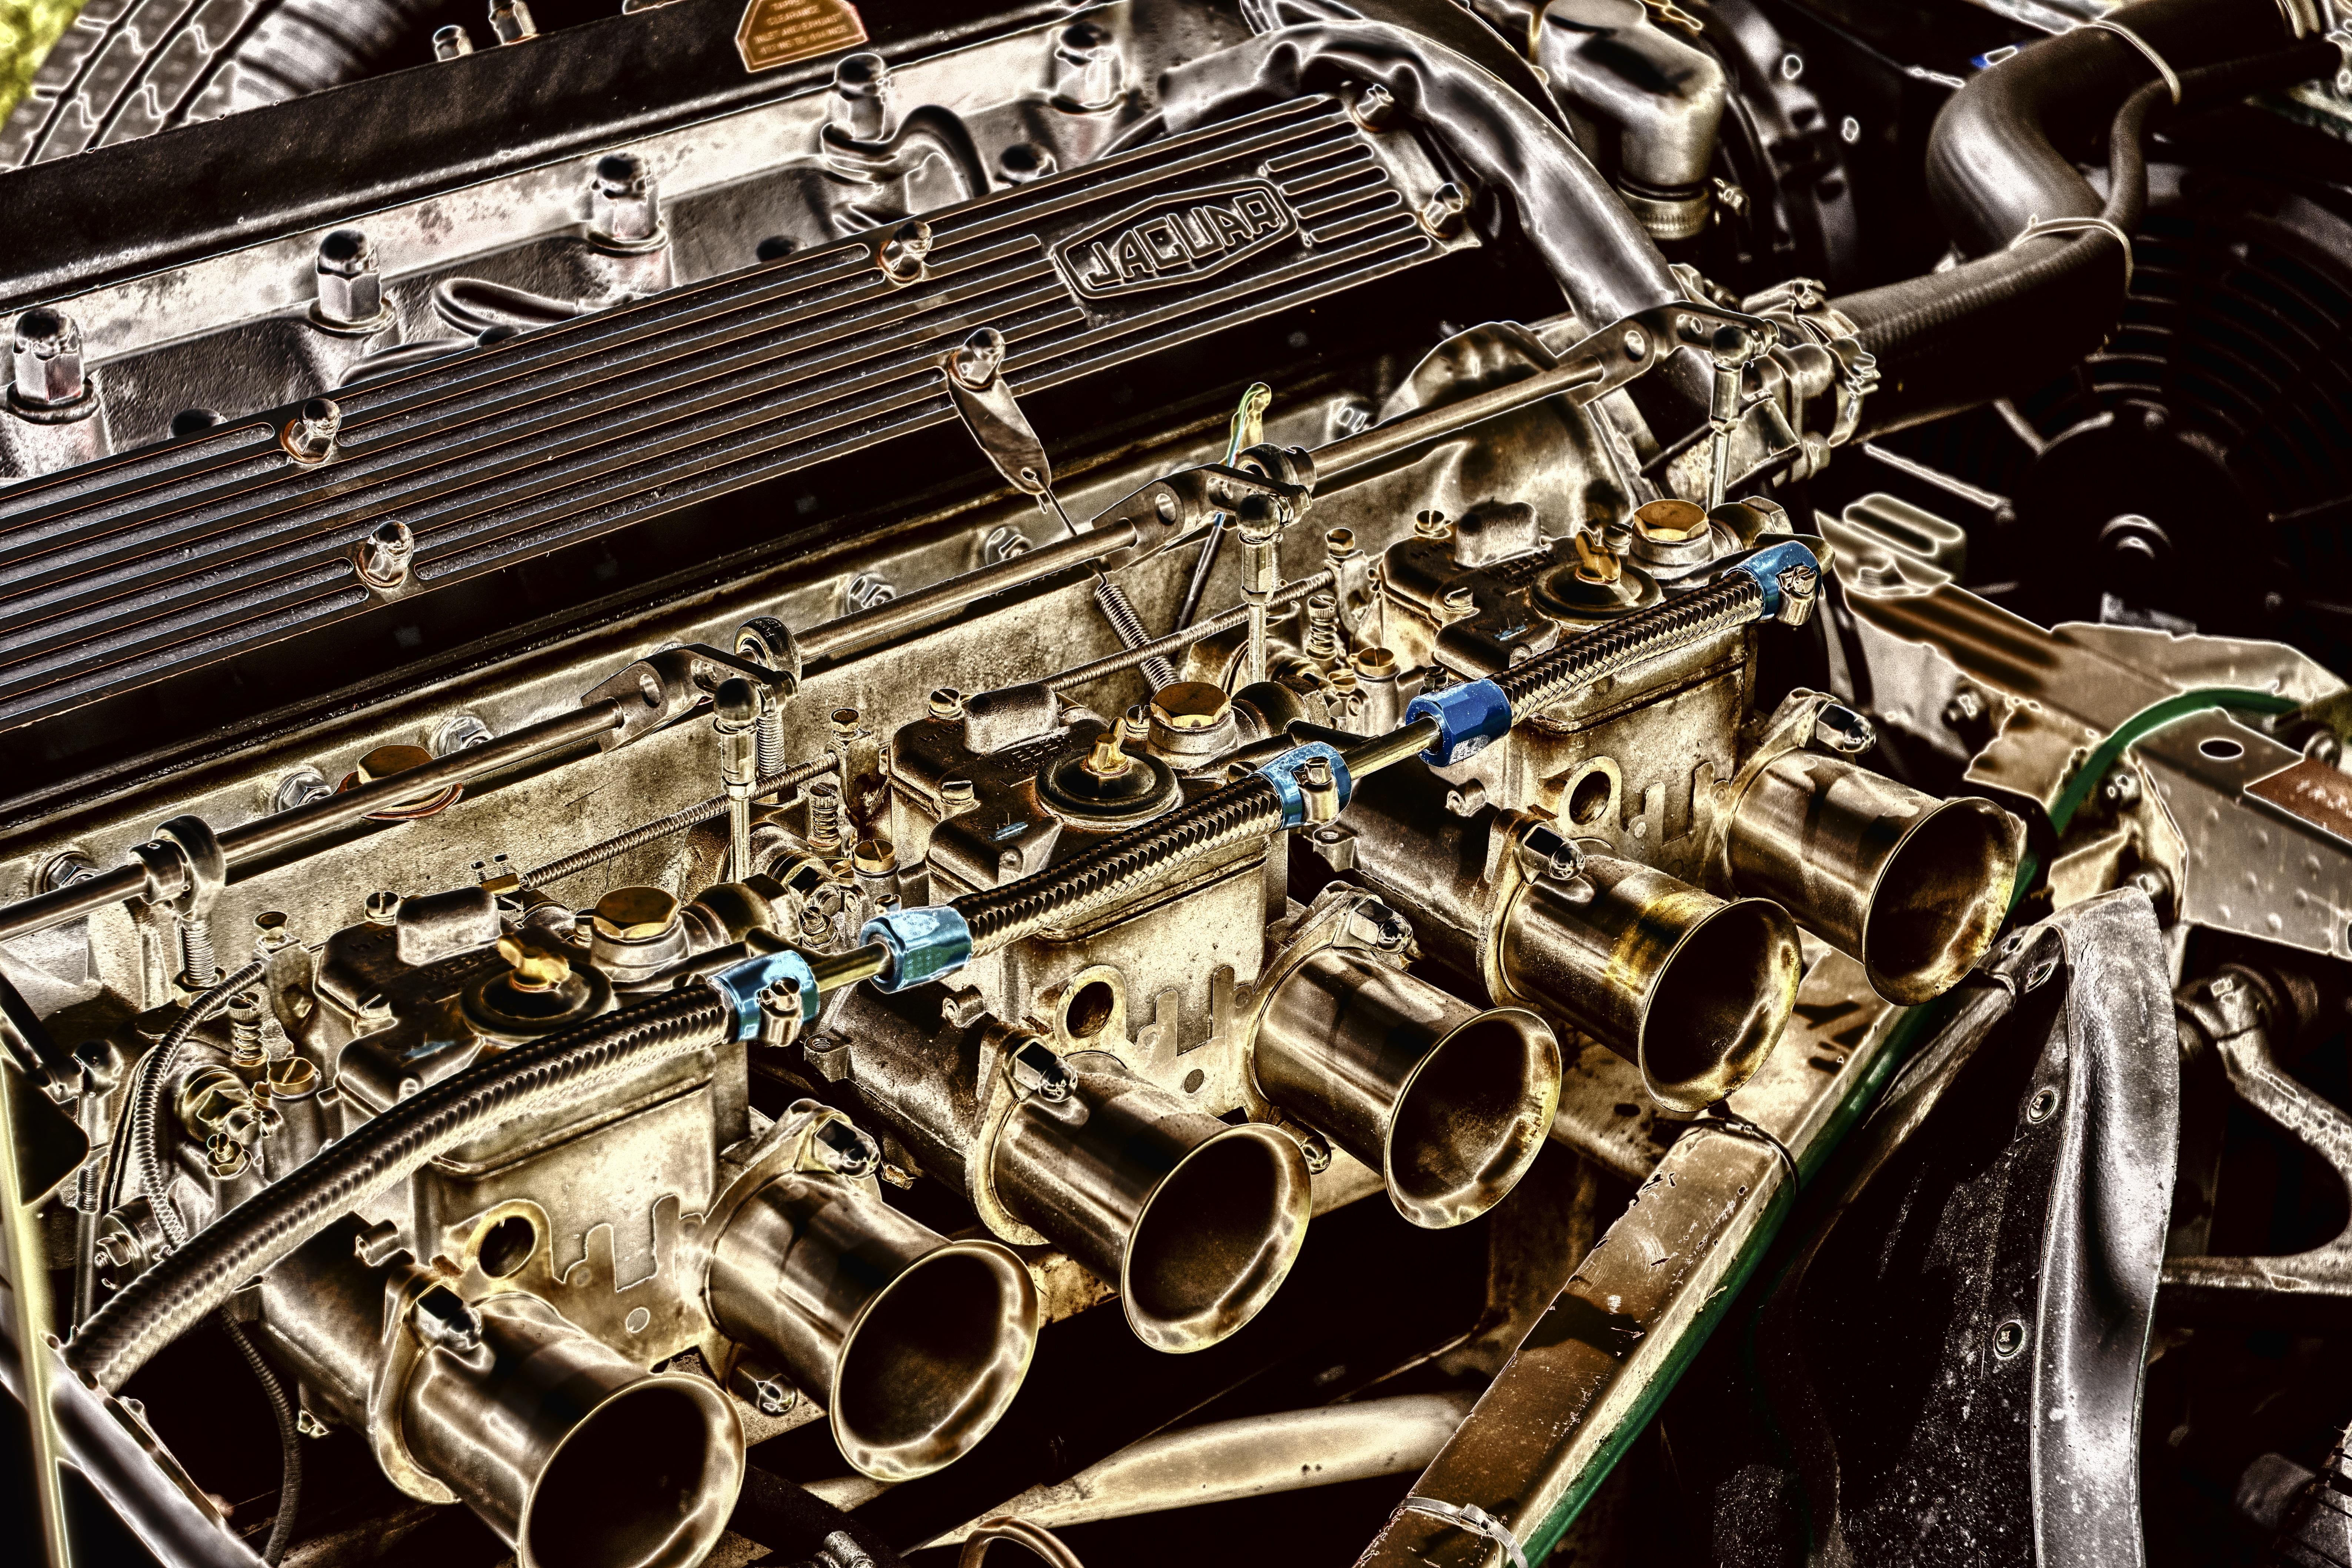 Free Images : car, vintage, automobile, retro, old, transportation ...